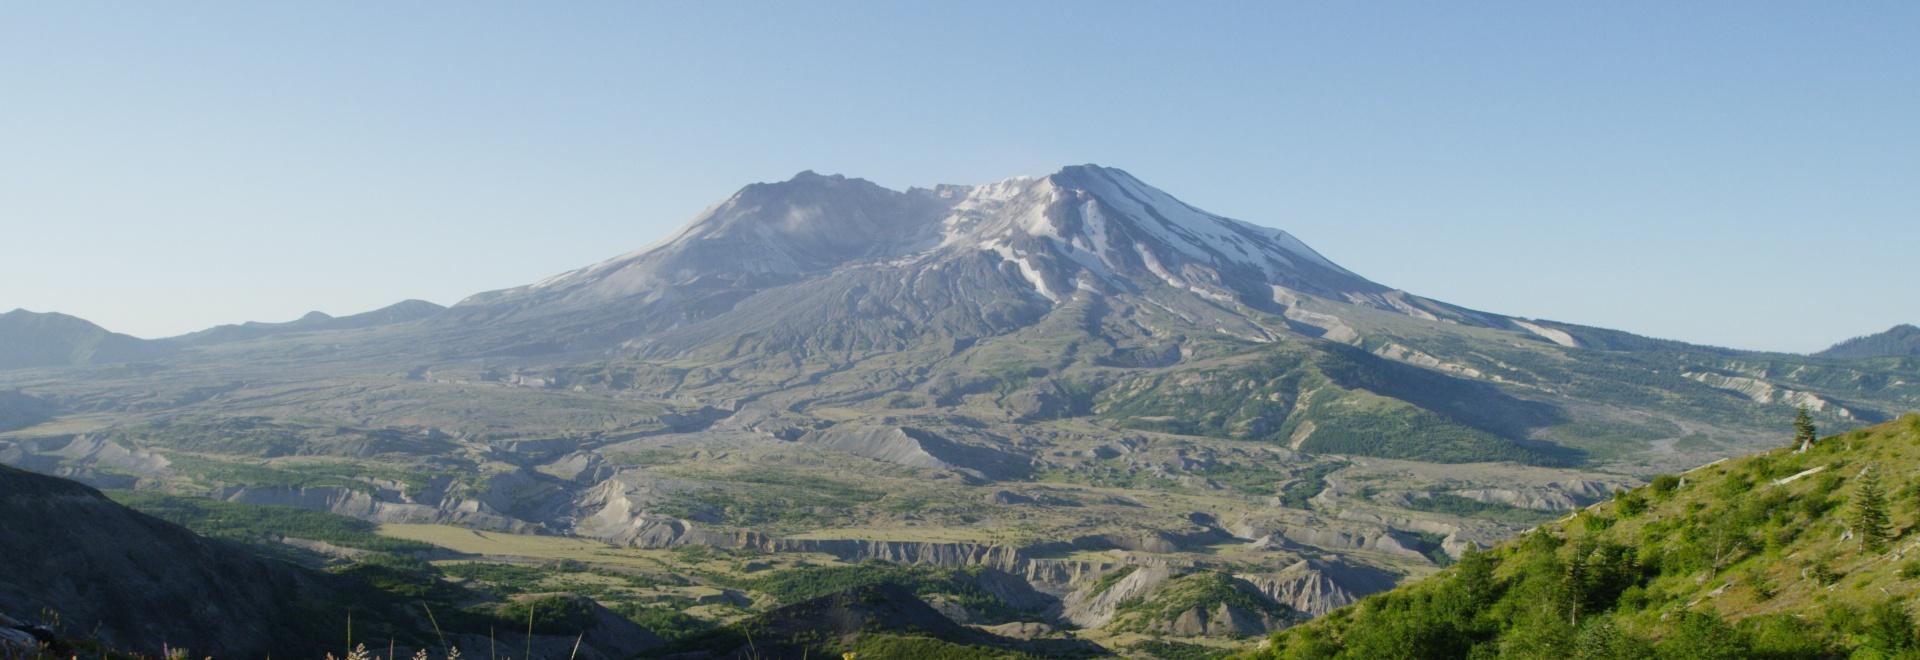 I monti Appalachi